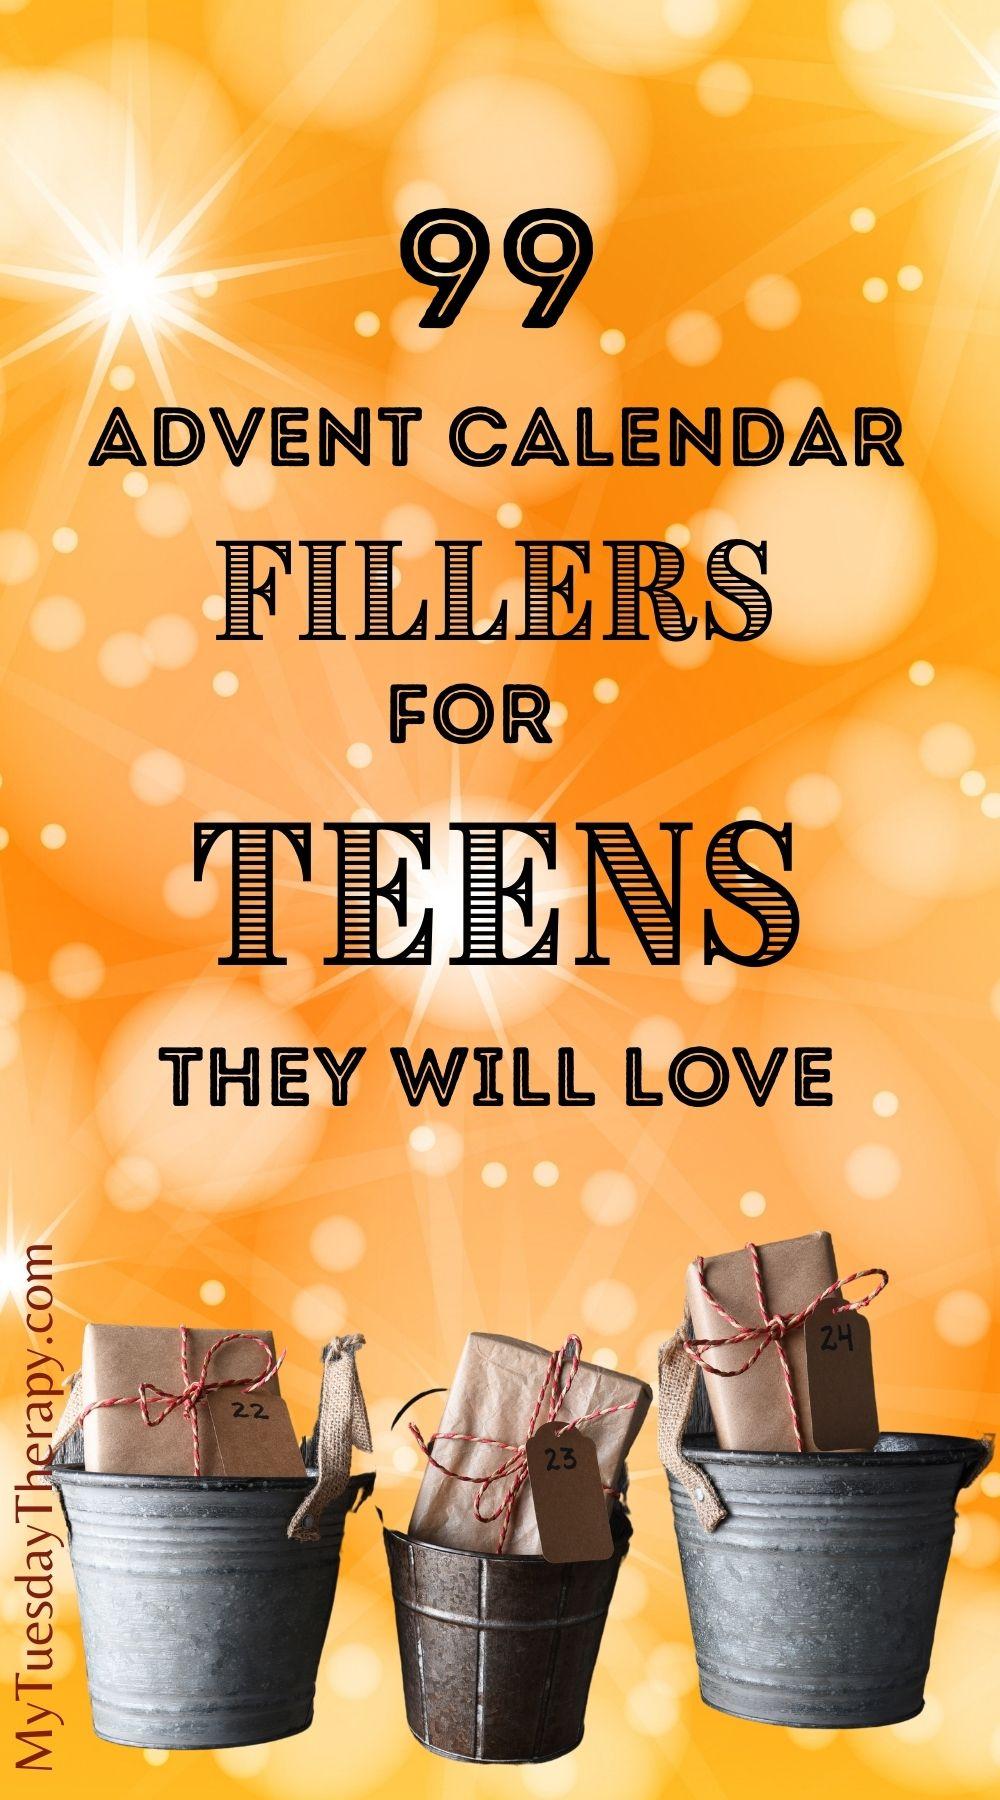 Advent calendar filler ideas for teenage girls and boys.